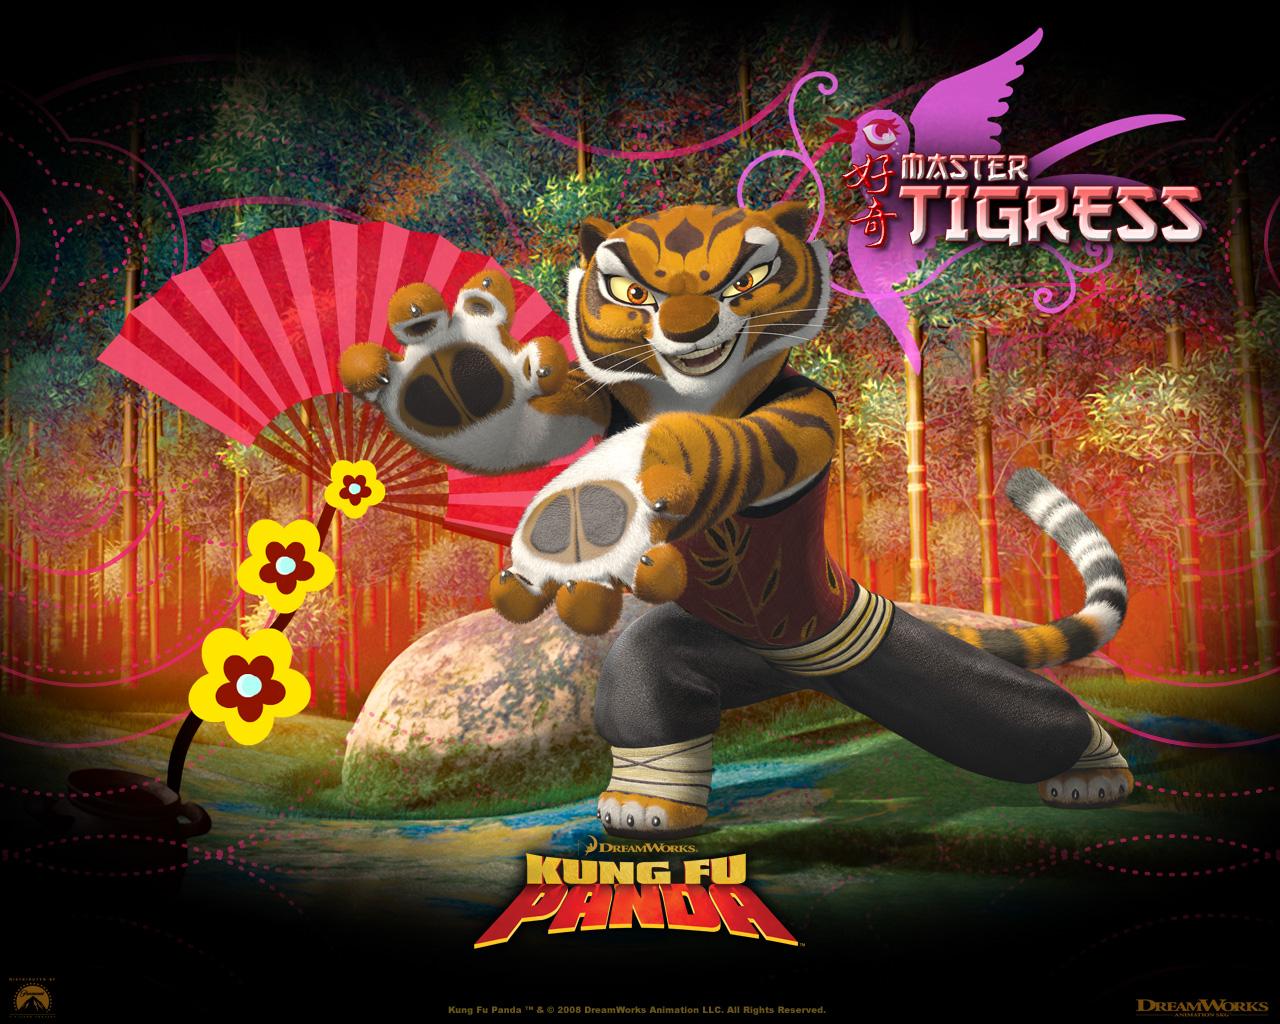 Kung fu panda hd wallpapers - Kung fu panda wallpaper ...